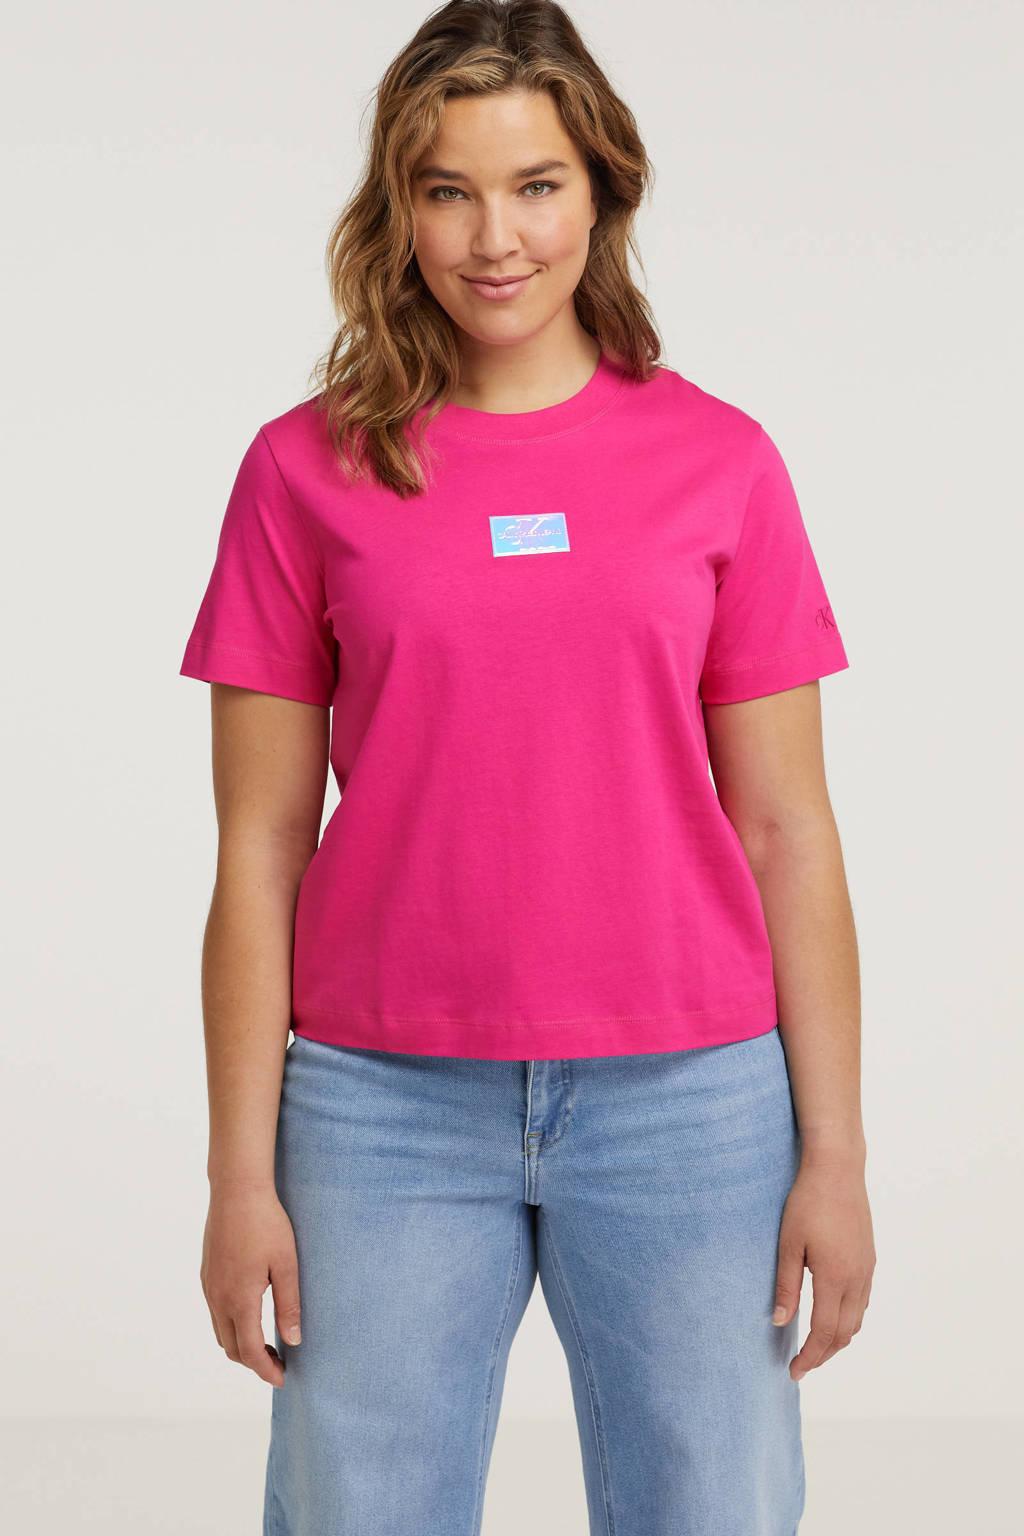 CALVIN KLEIN Plus T-shirt van biologisch katoen fuchsia/multi, Fuchsia/multi